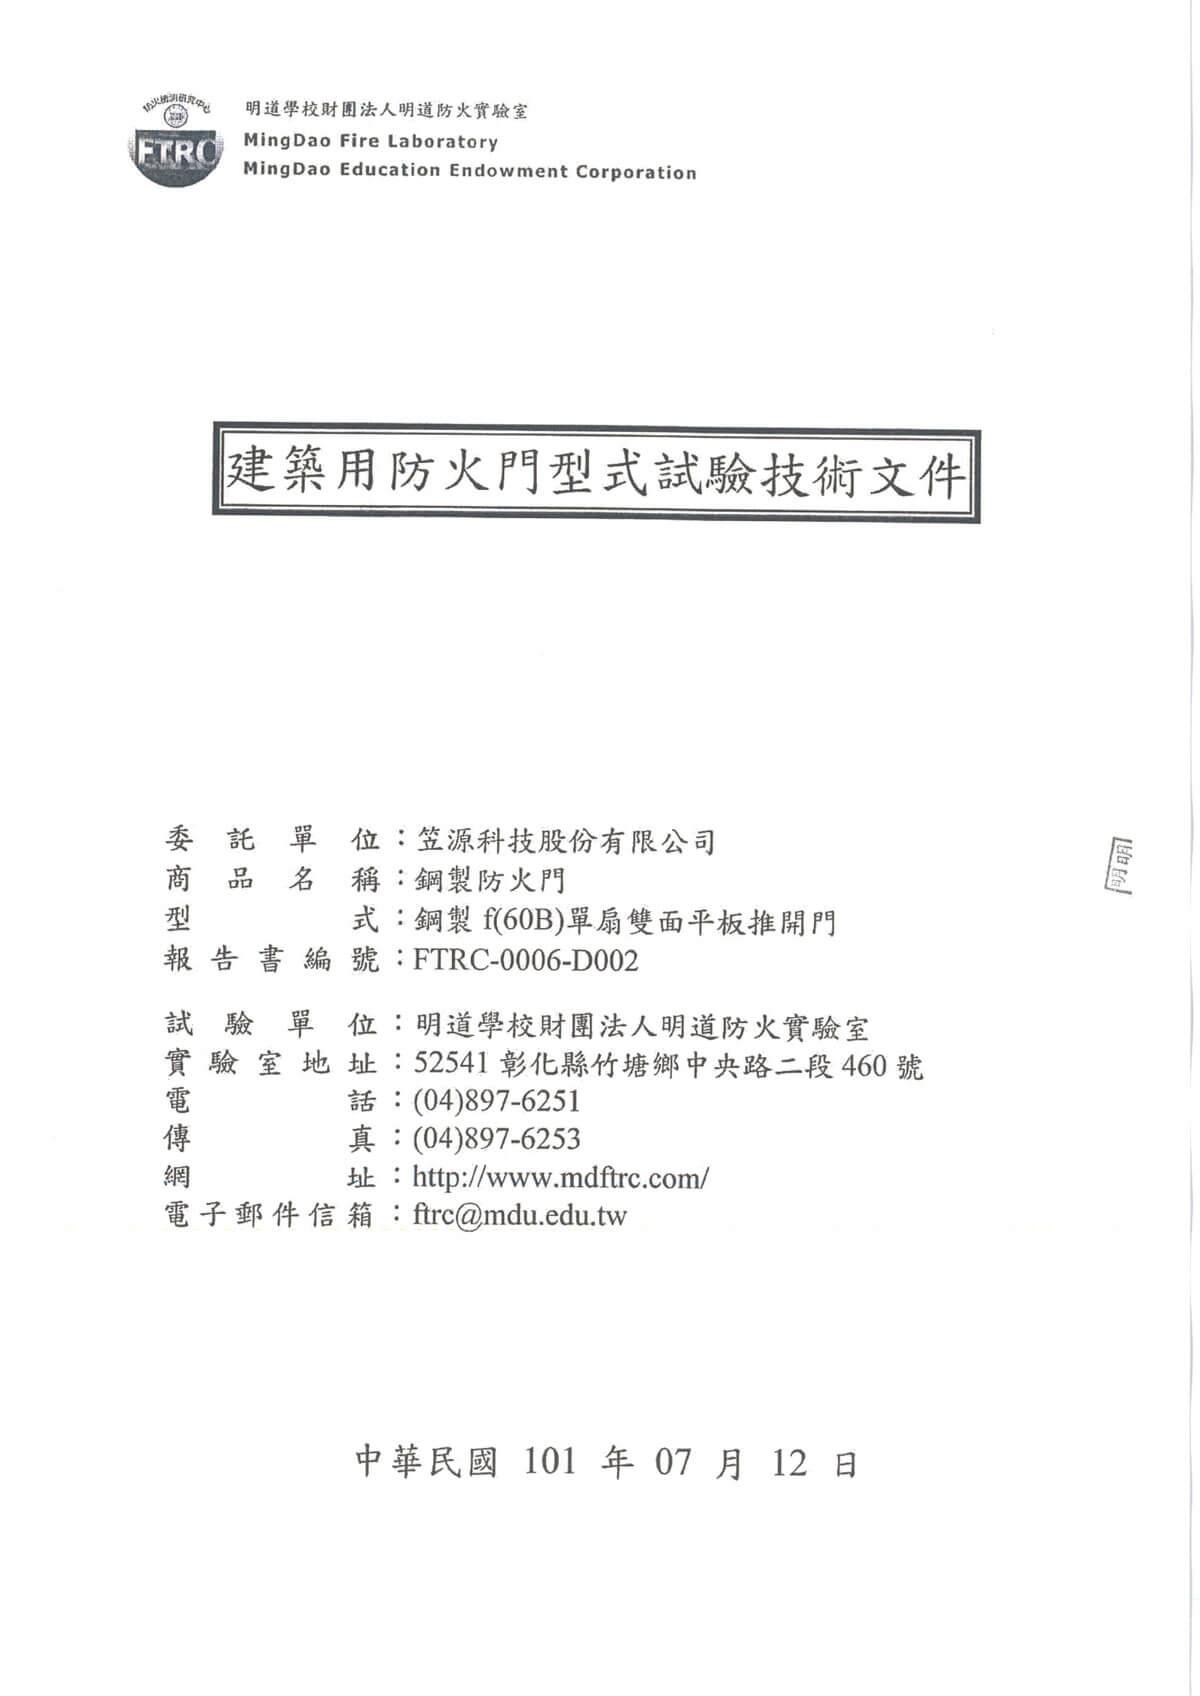 fireproof_report_K51M_K513D-1-4